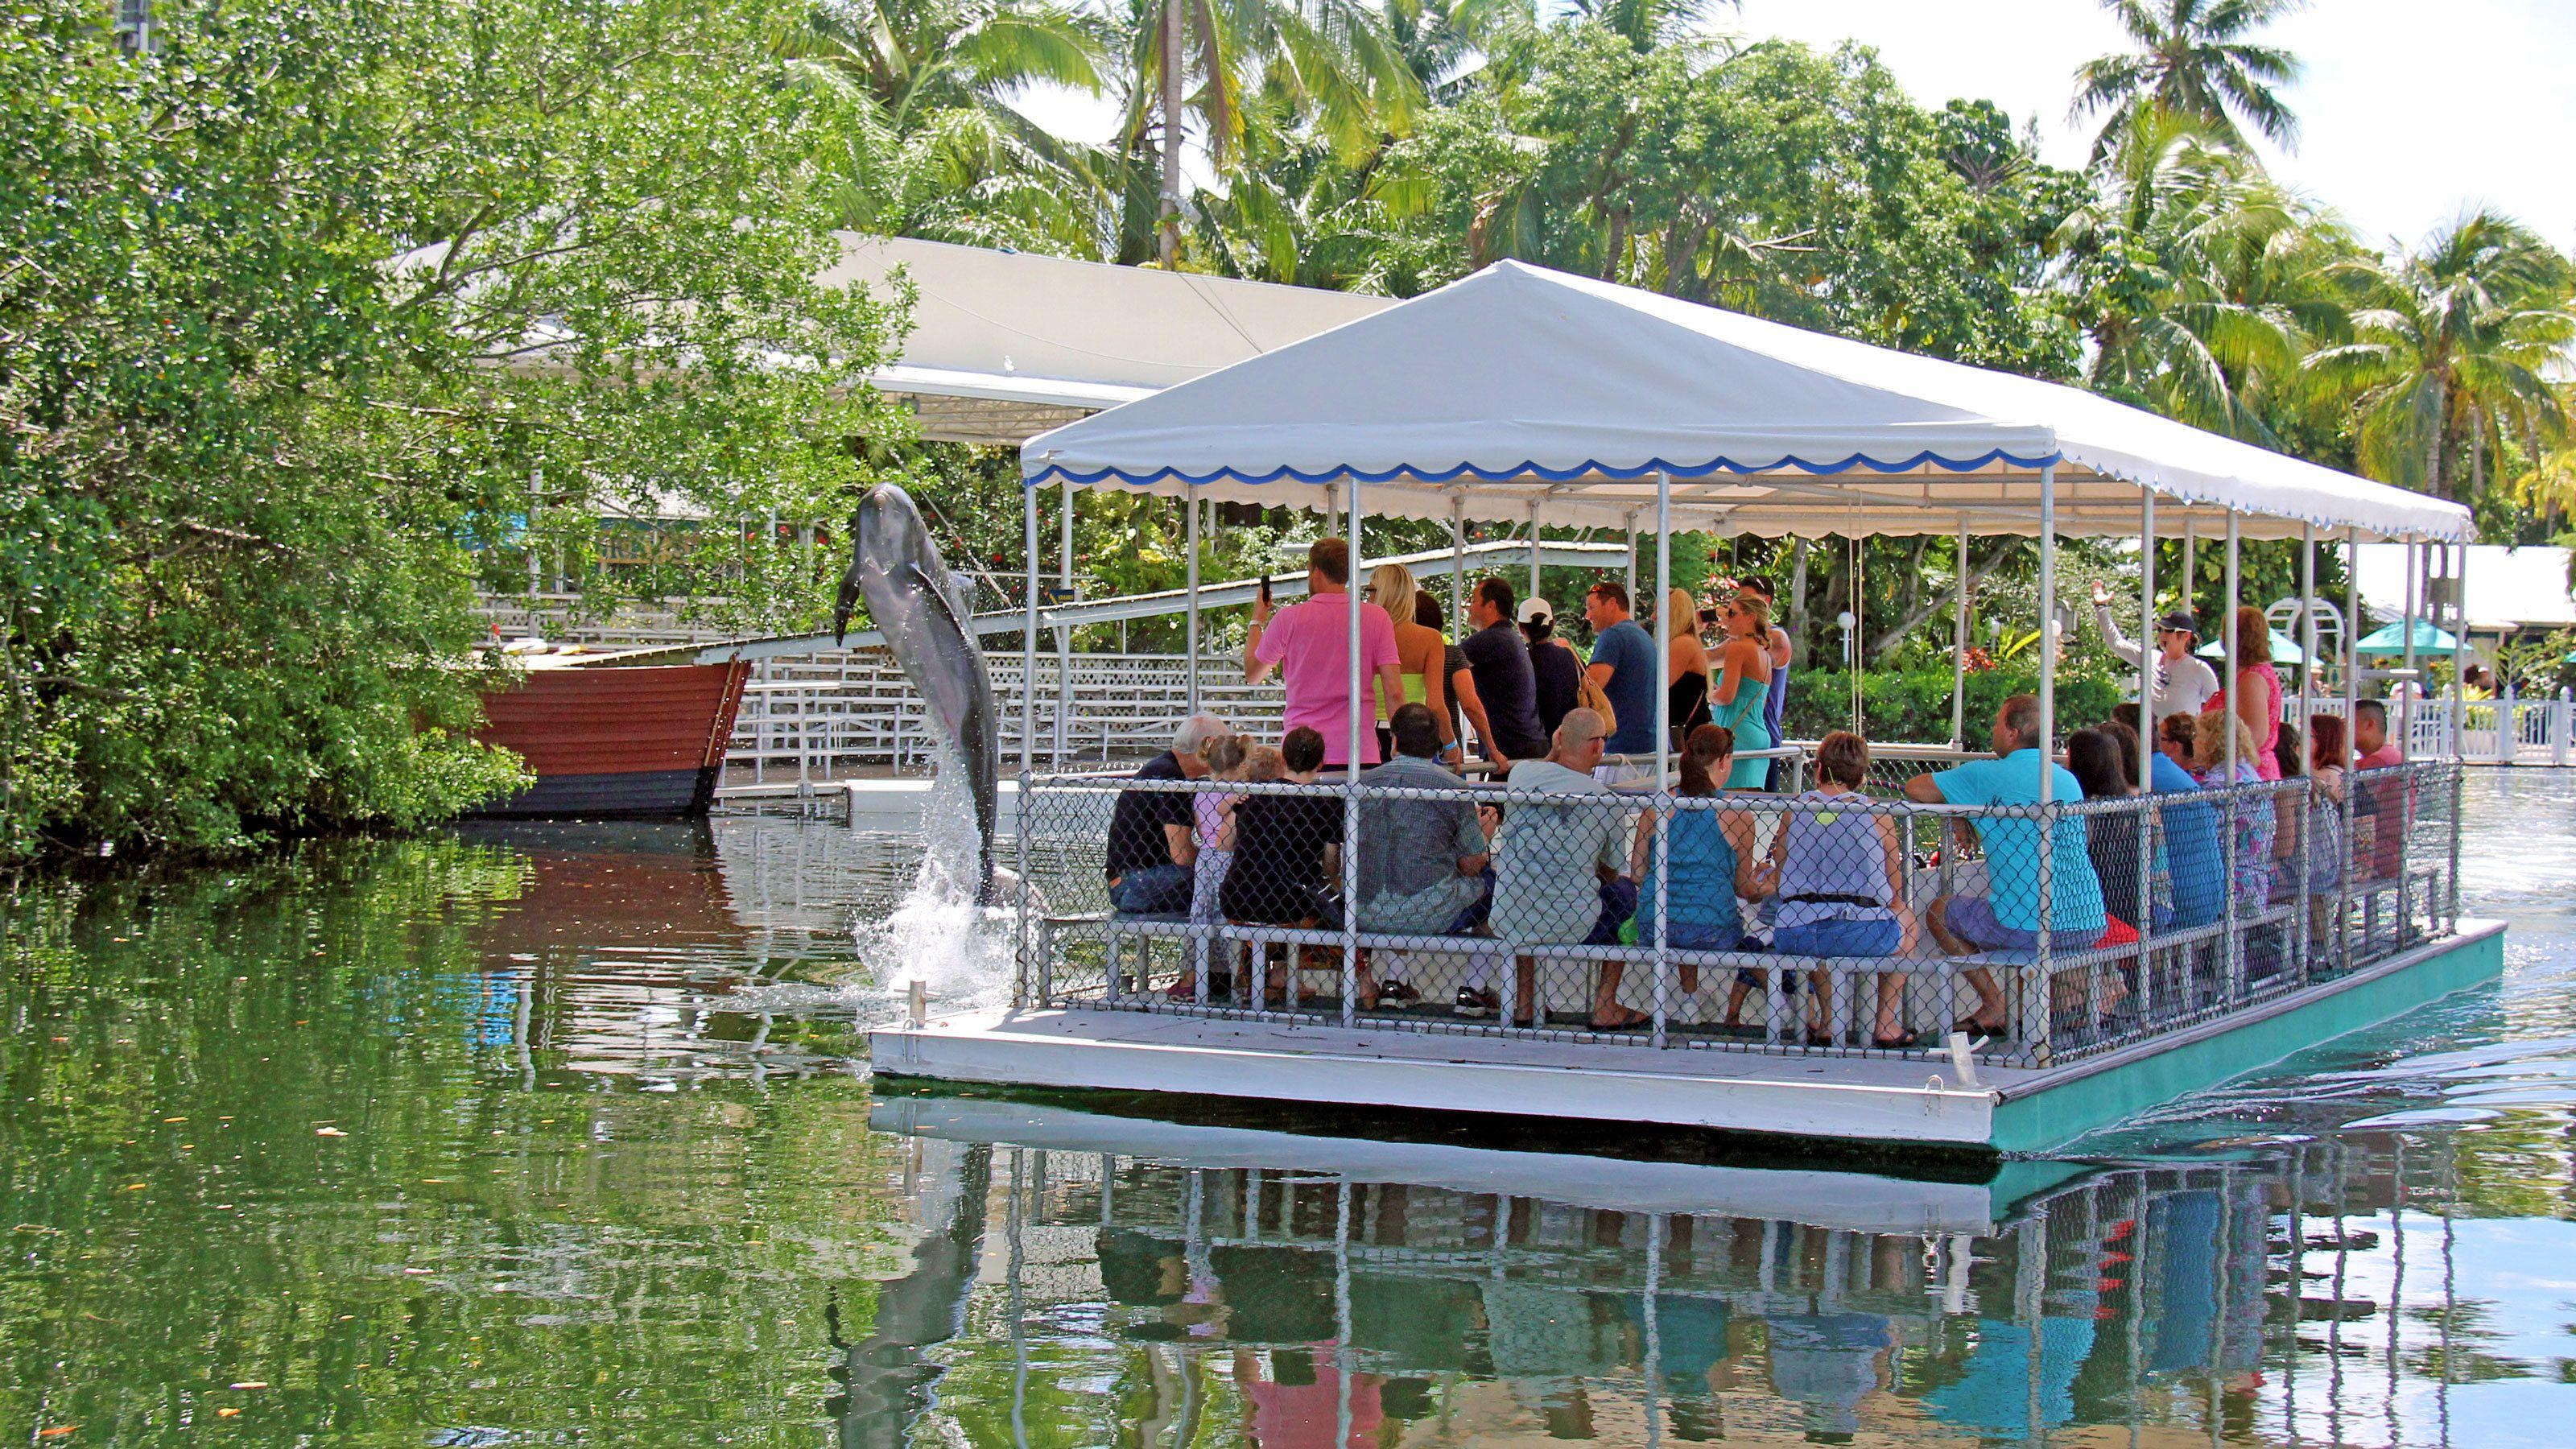 Boat sail at Theater of the Sea in Islamorada, Florida